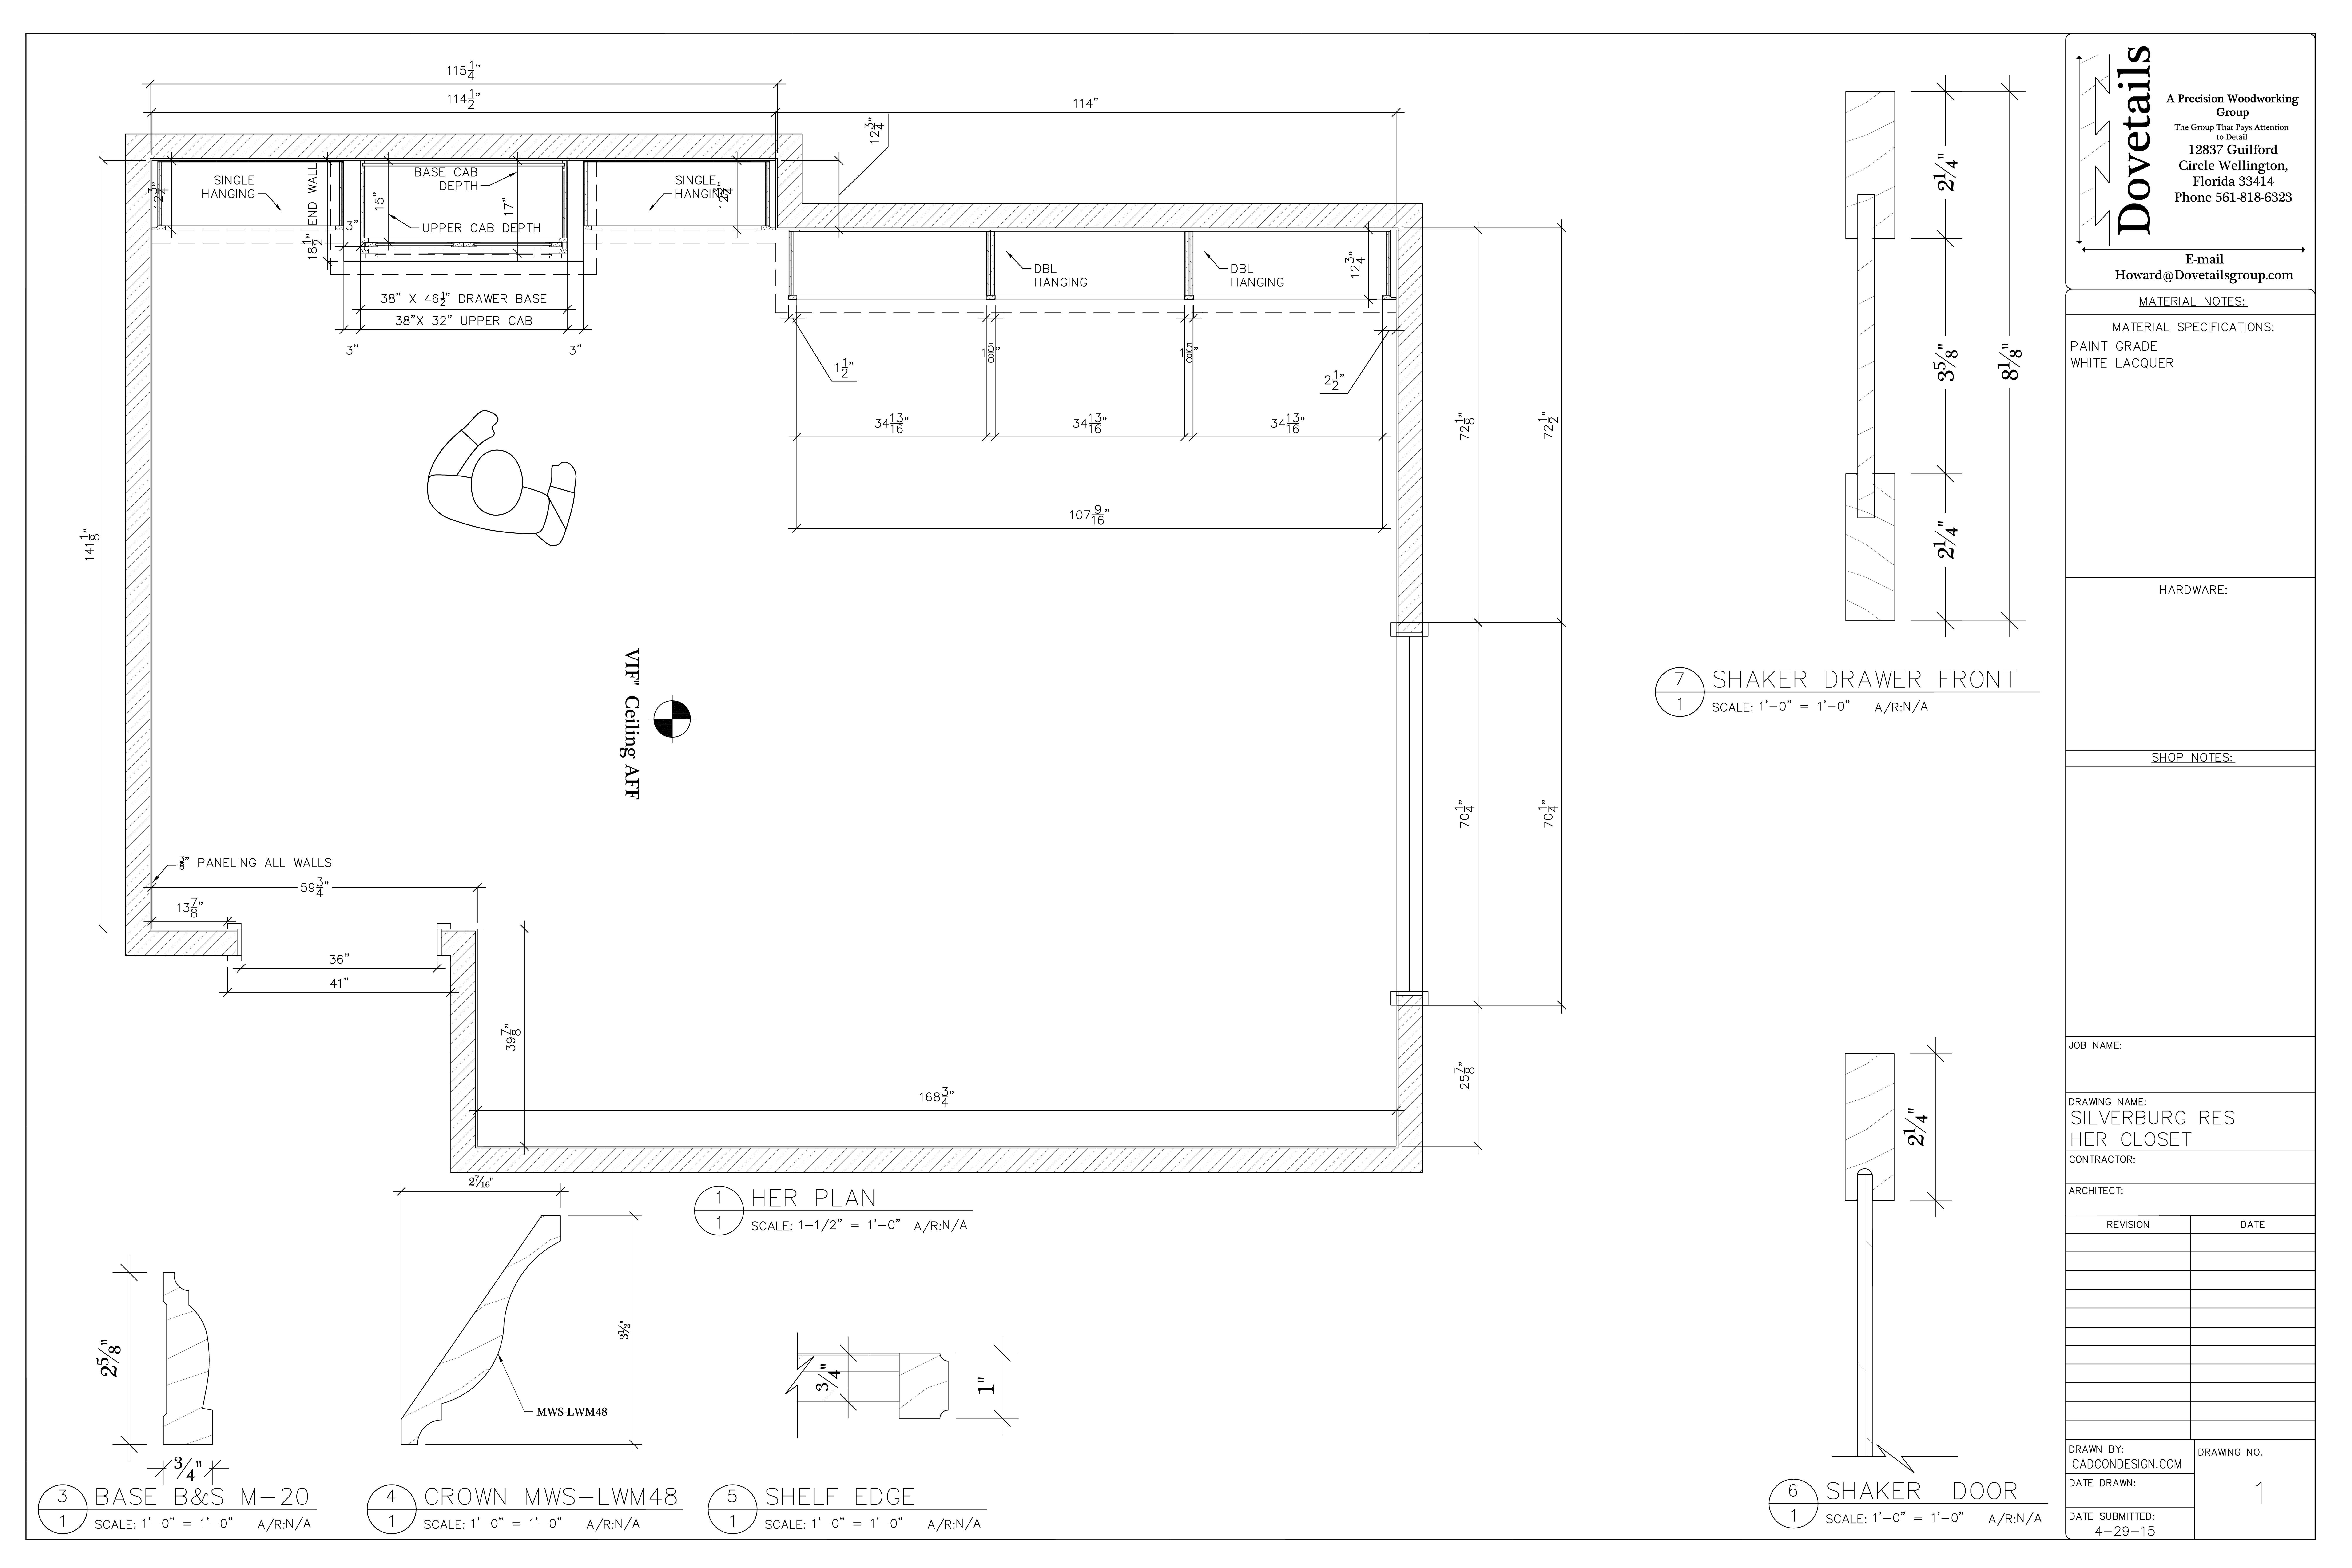 Cadkitchenplans com millwork shop drawings cabinet shop drawings - Millwork Shop Drawings For Residential Custom Millwork Closets